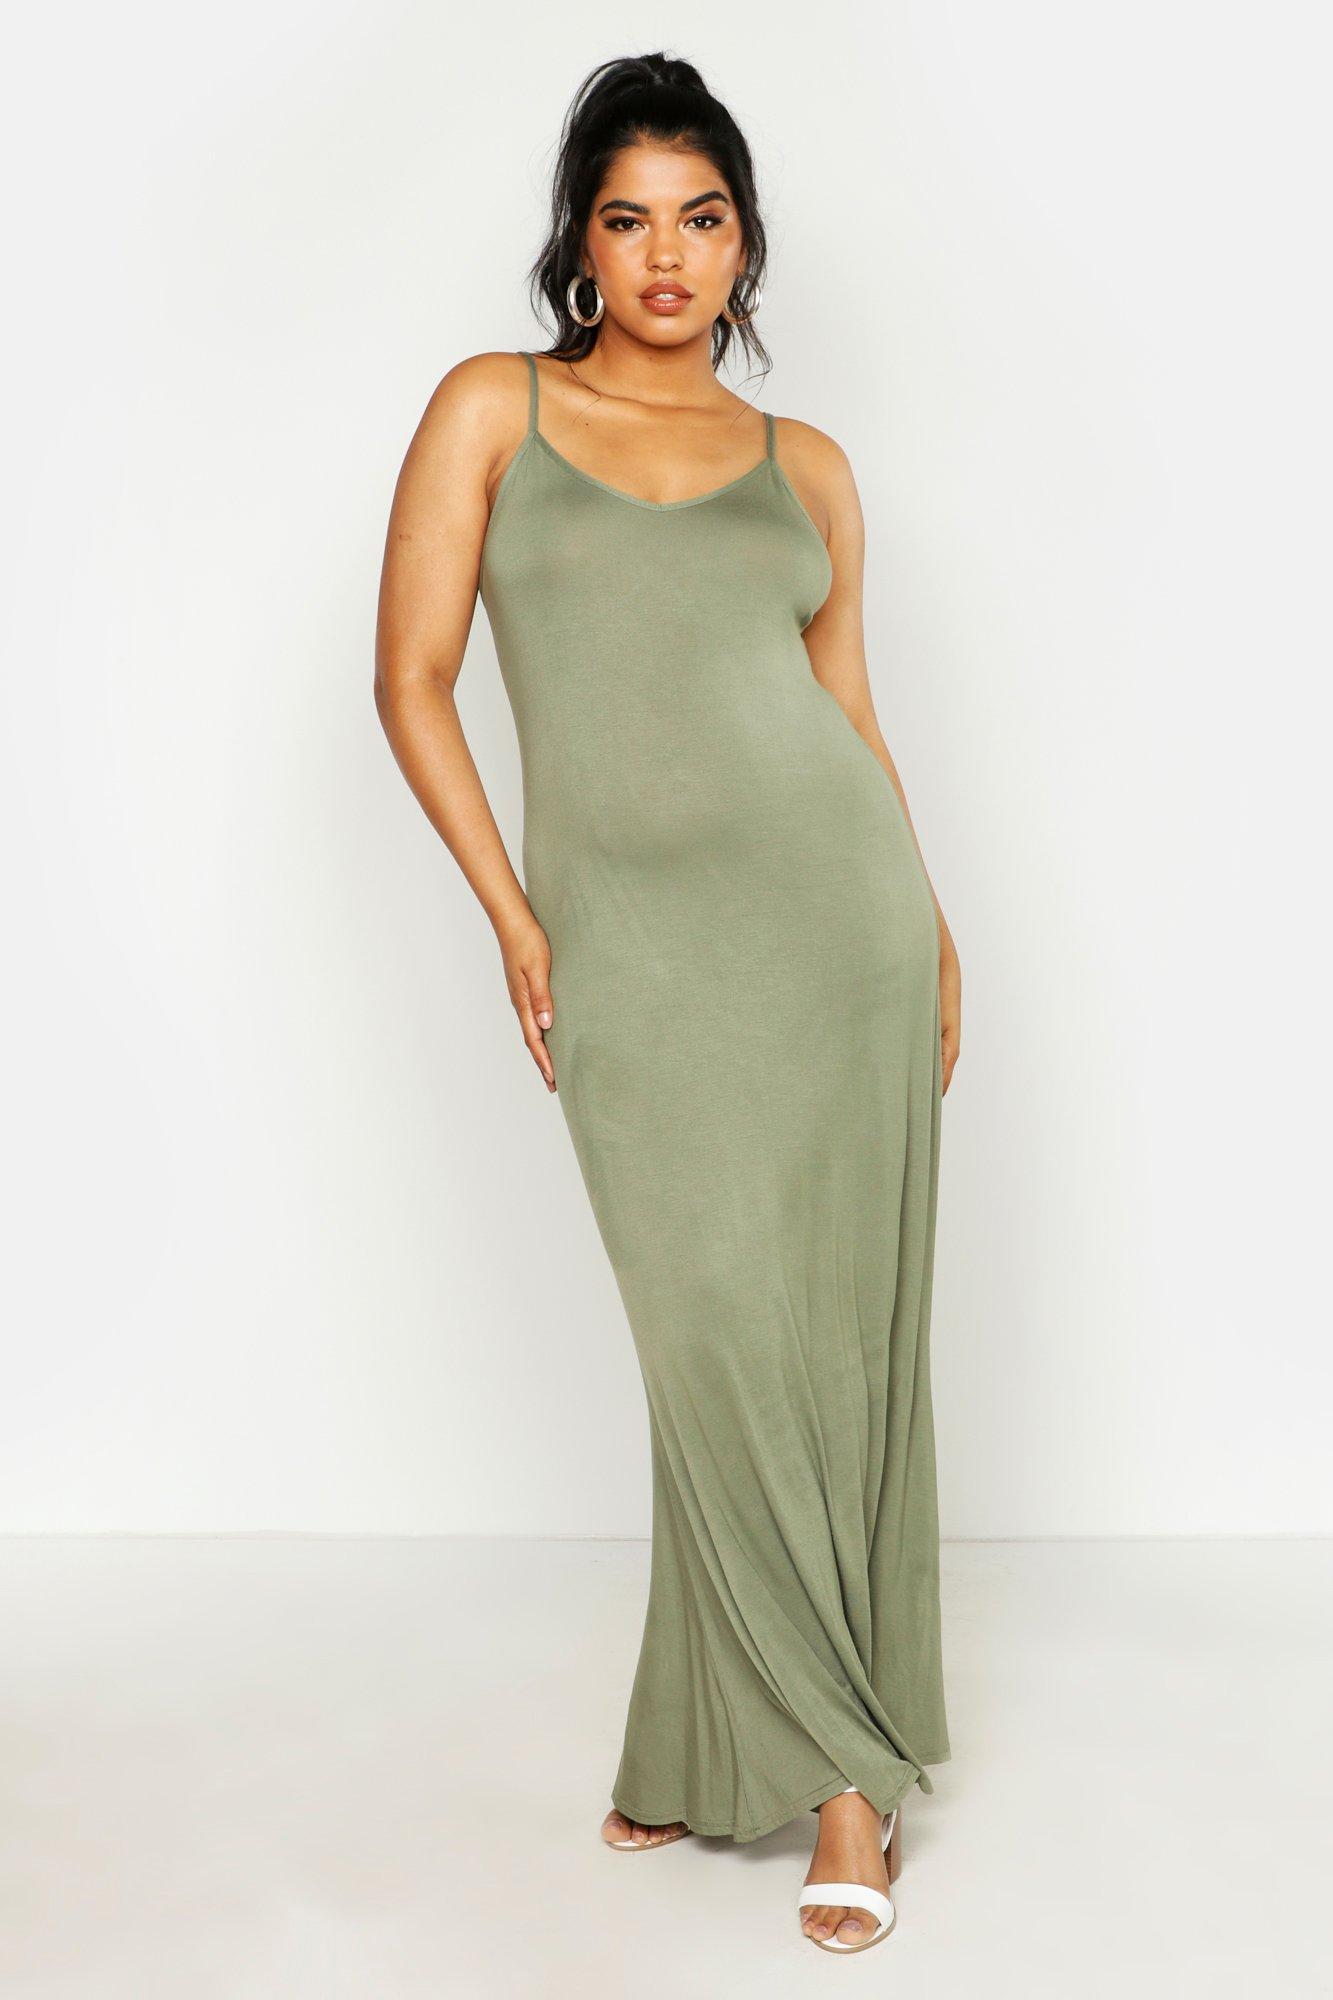 Boohoo | Плюс сайз — Базовое воздушное макси-платье | Clouty